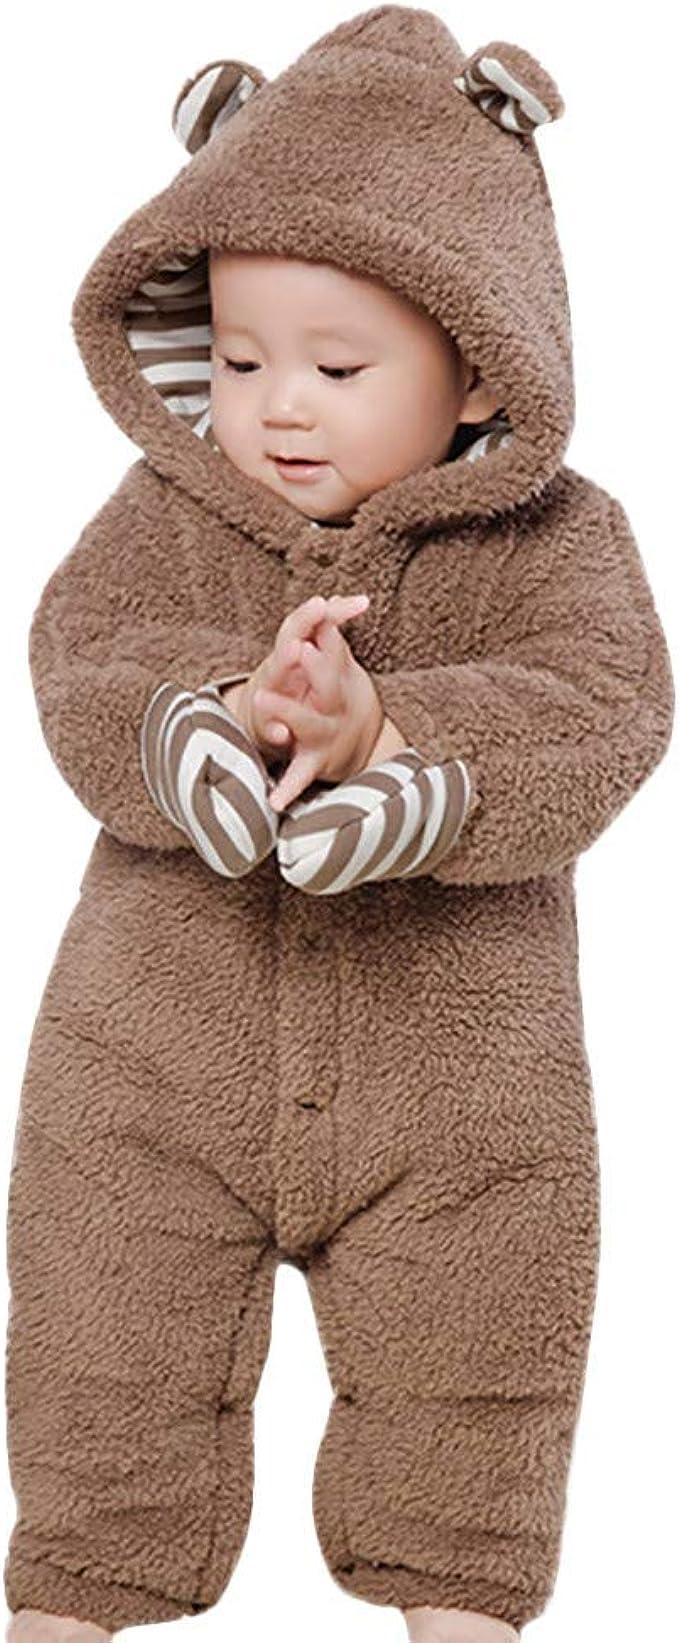 Ceguimos Newborn Baby Jacket Snowsuit Hooded Romper Jumpsuit Warm Fleece Cartoon Bear 0-12 Months